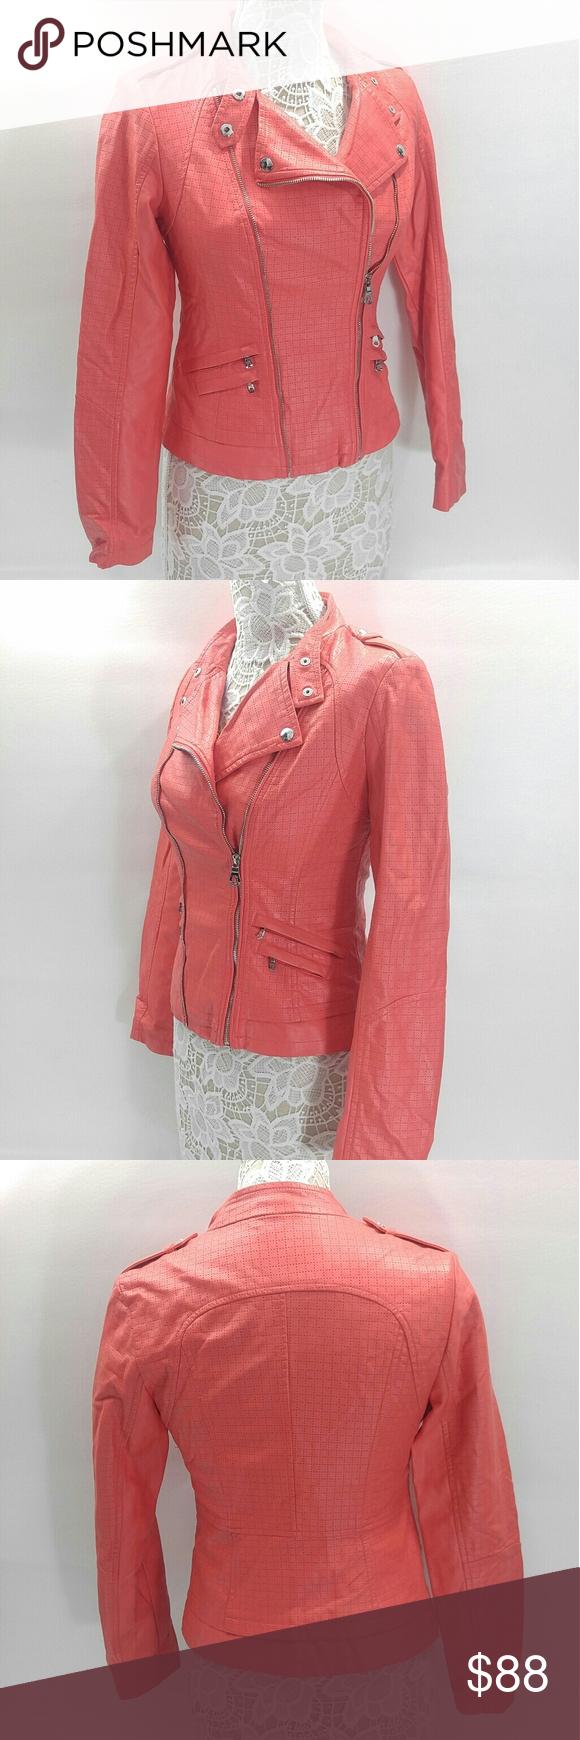 Guess Faux Leather Biker Jacket Gr661224 Coral Leather Jacket Clothes Design Fashion [ 1740 x 580 Pixel ]